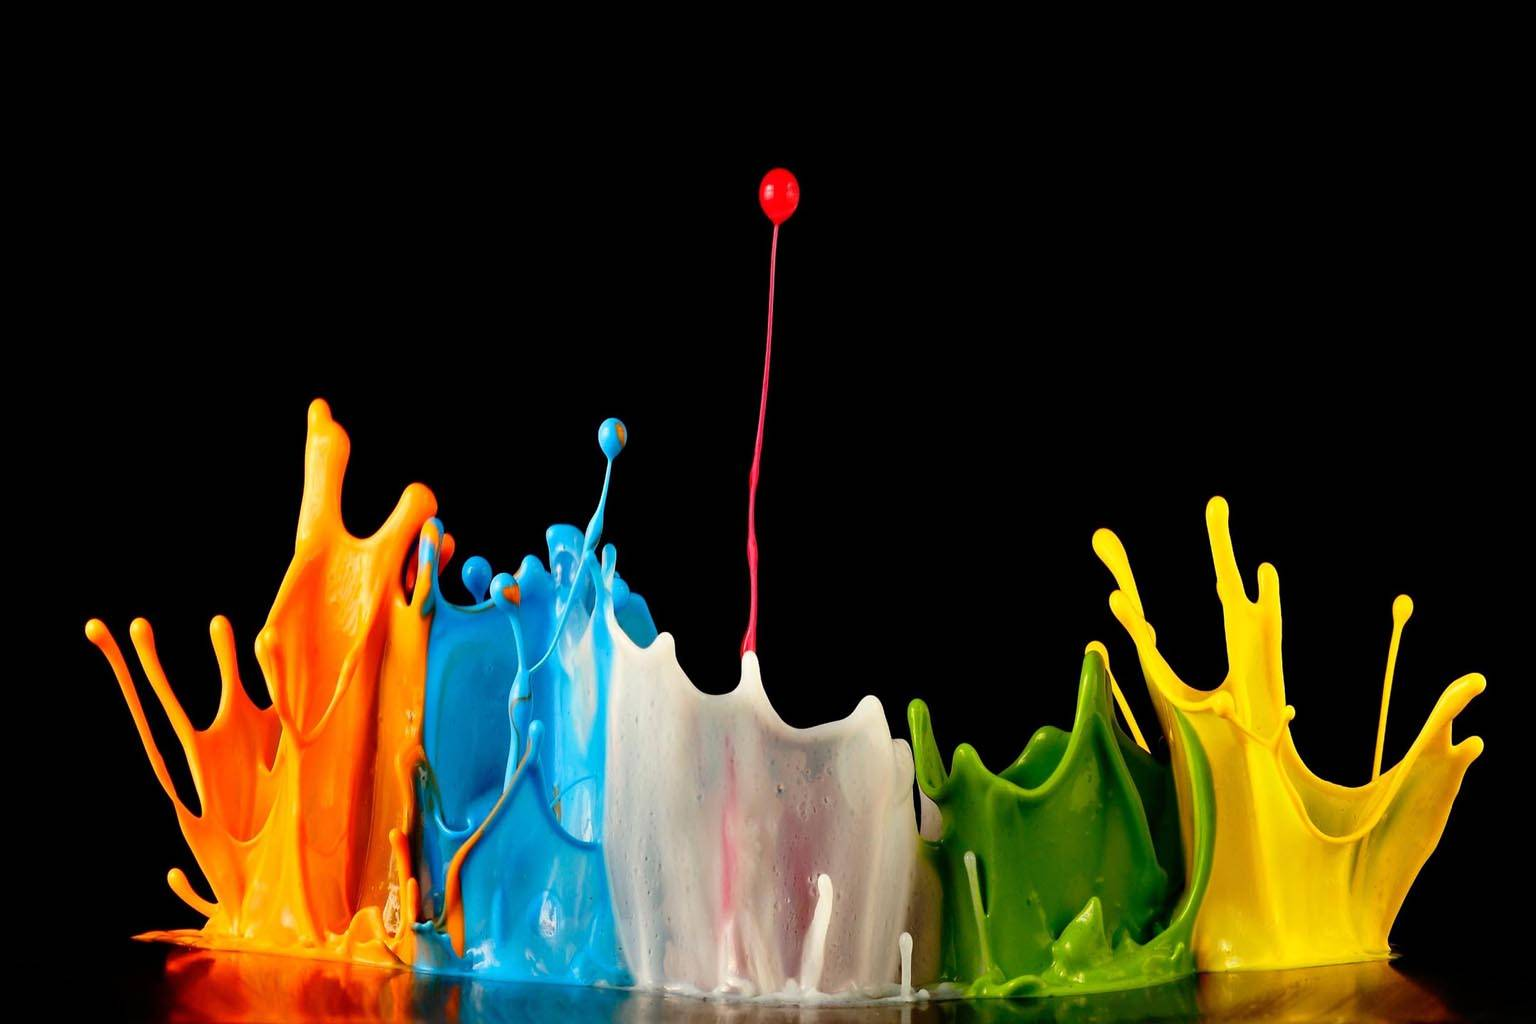 Splash painting